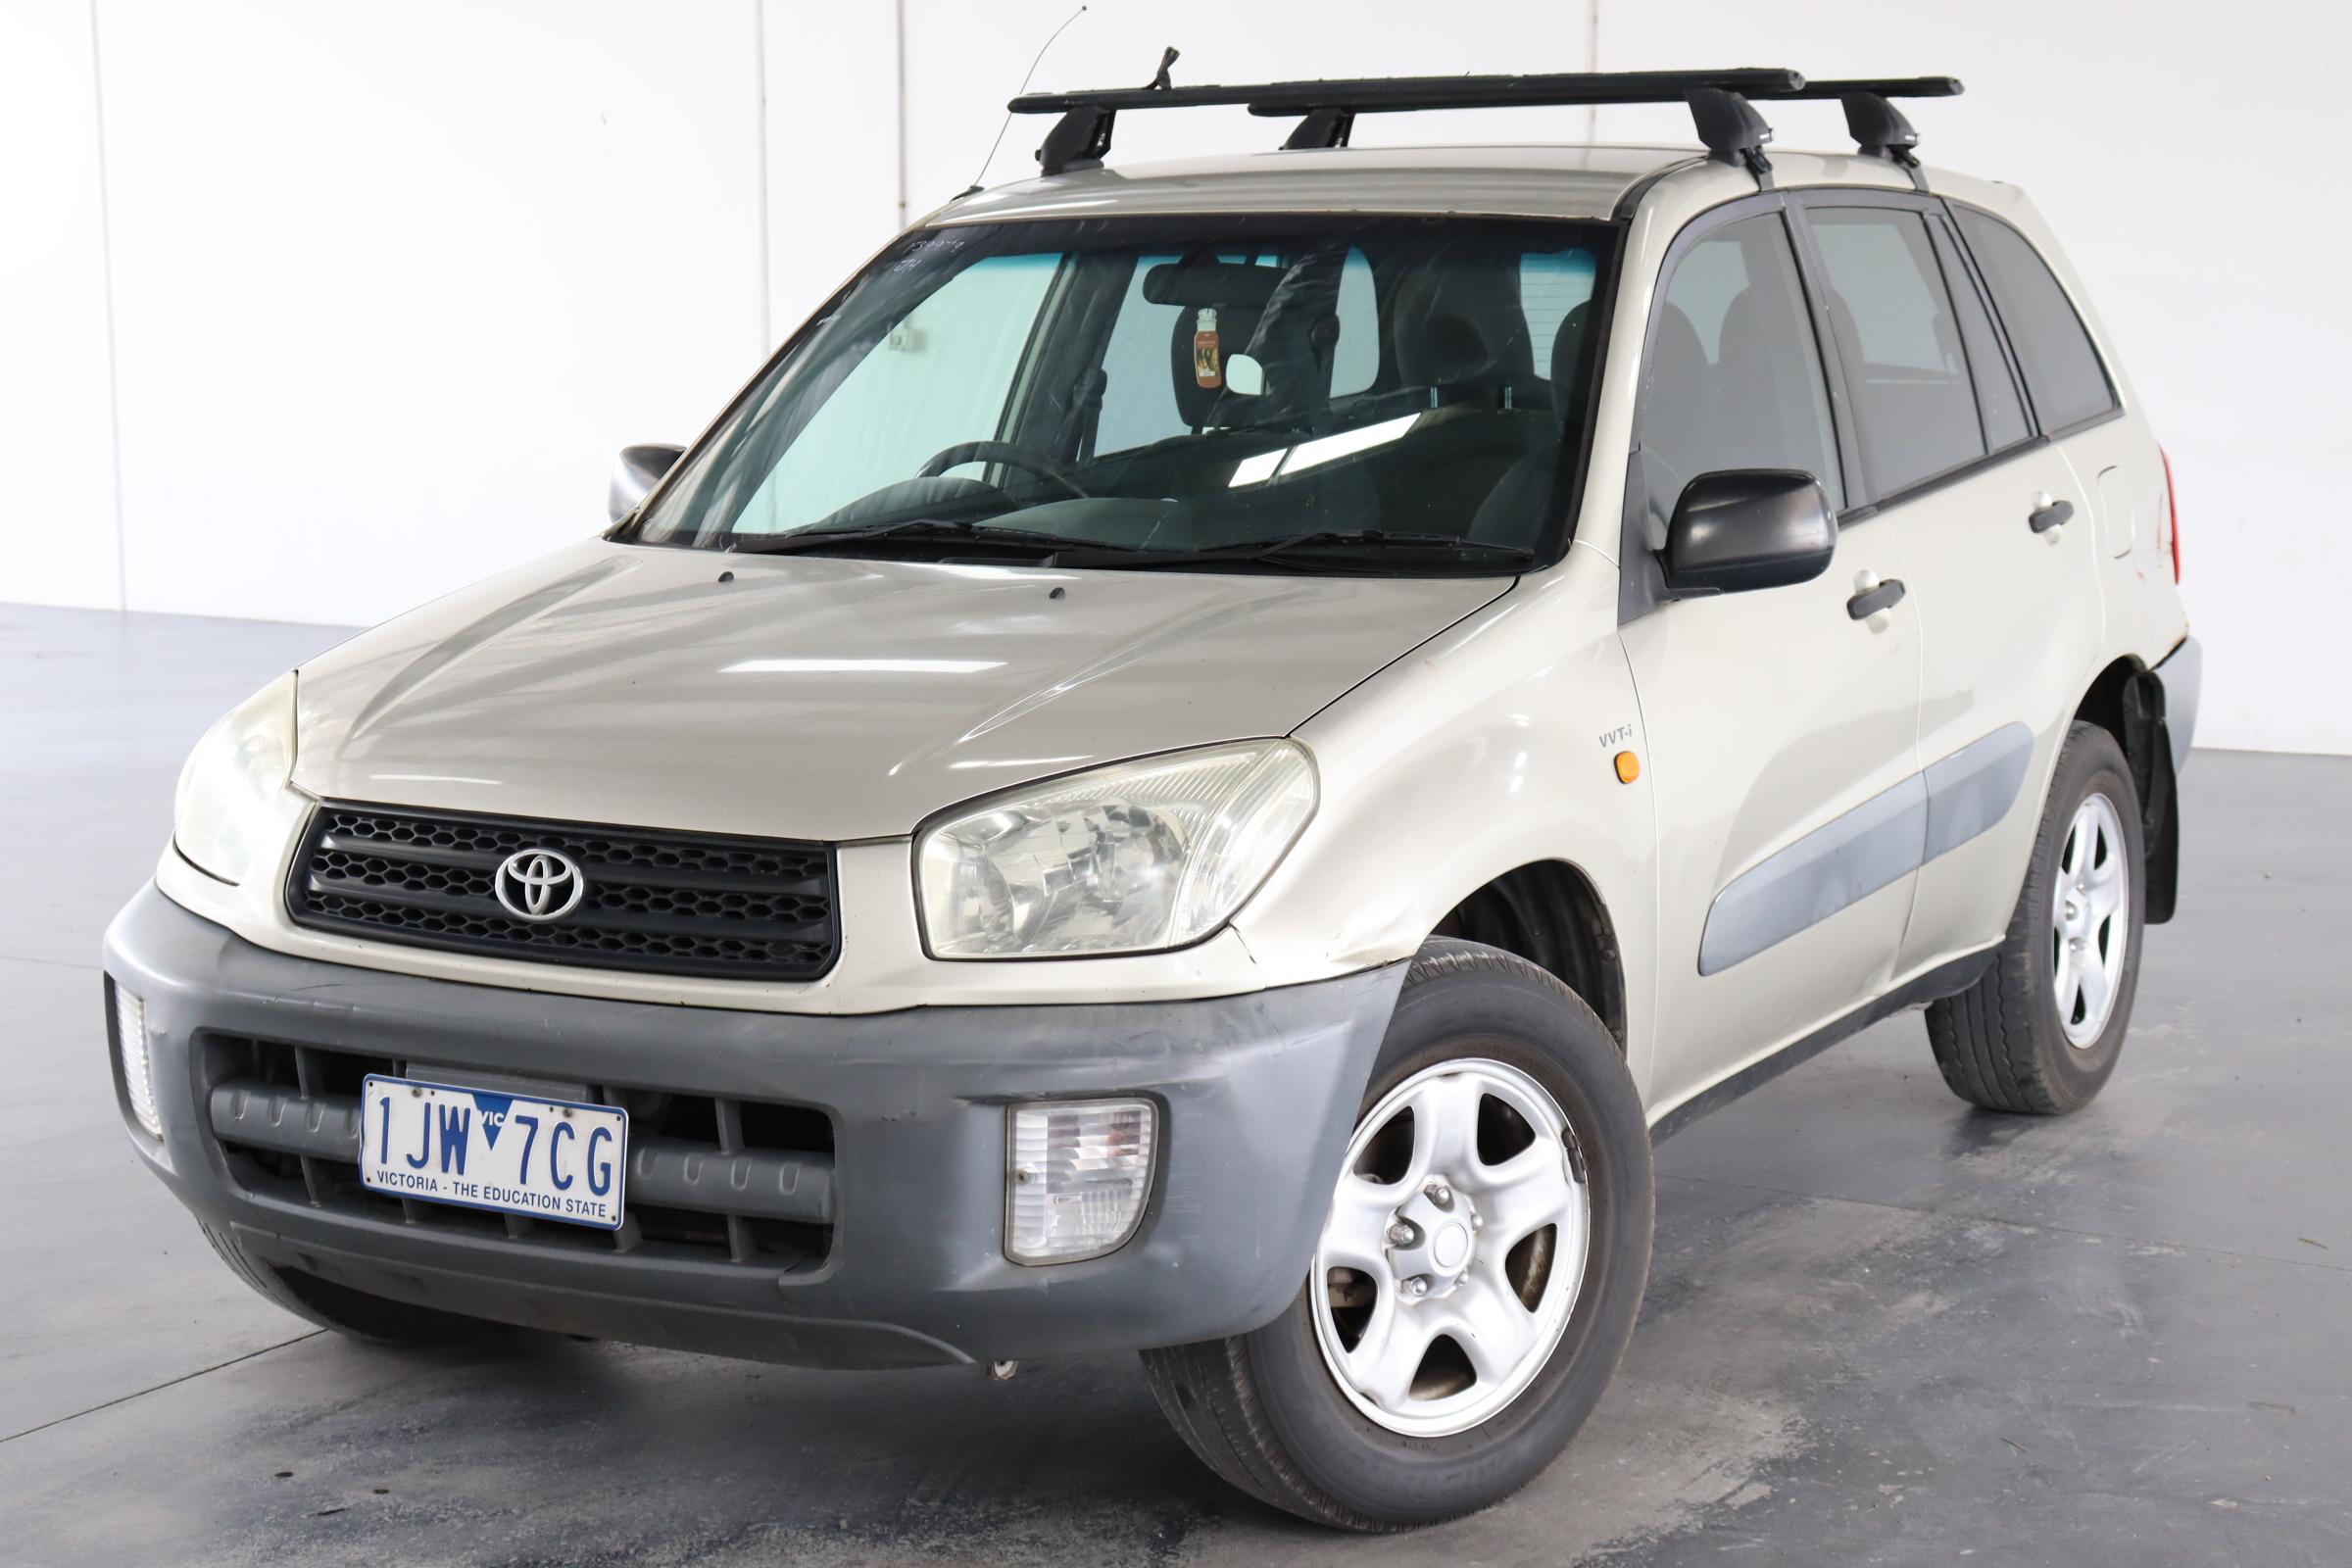 2002 Toyota Rav 4 Edge (4x4) Automatic Wagon